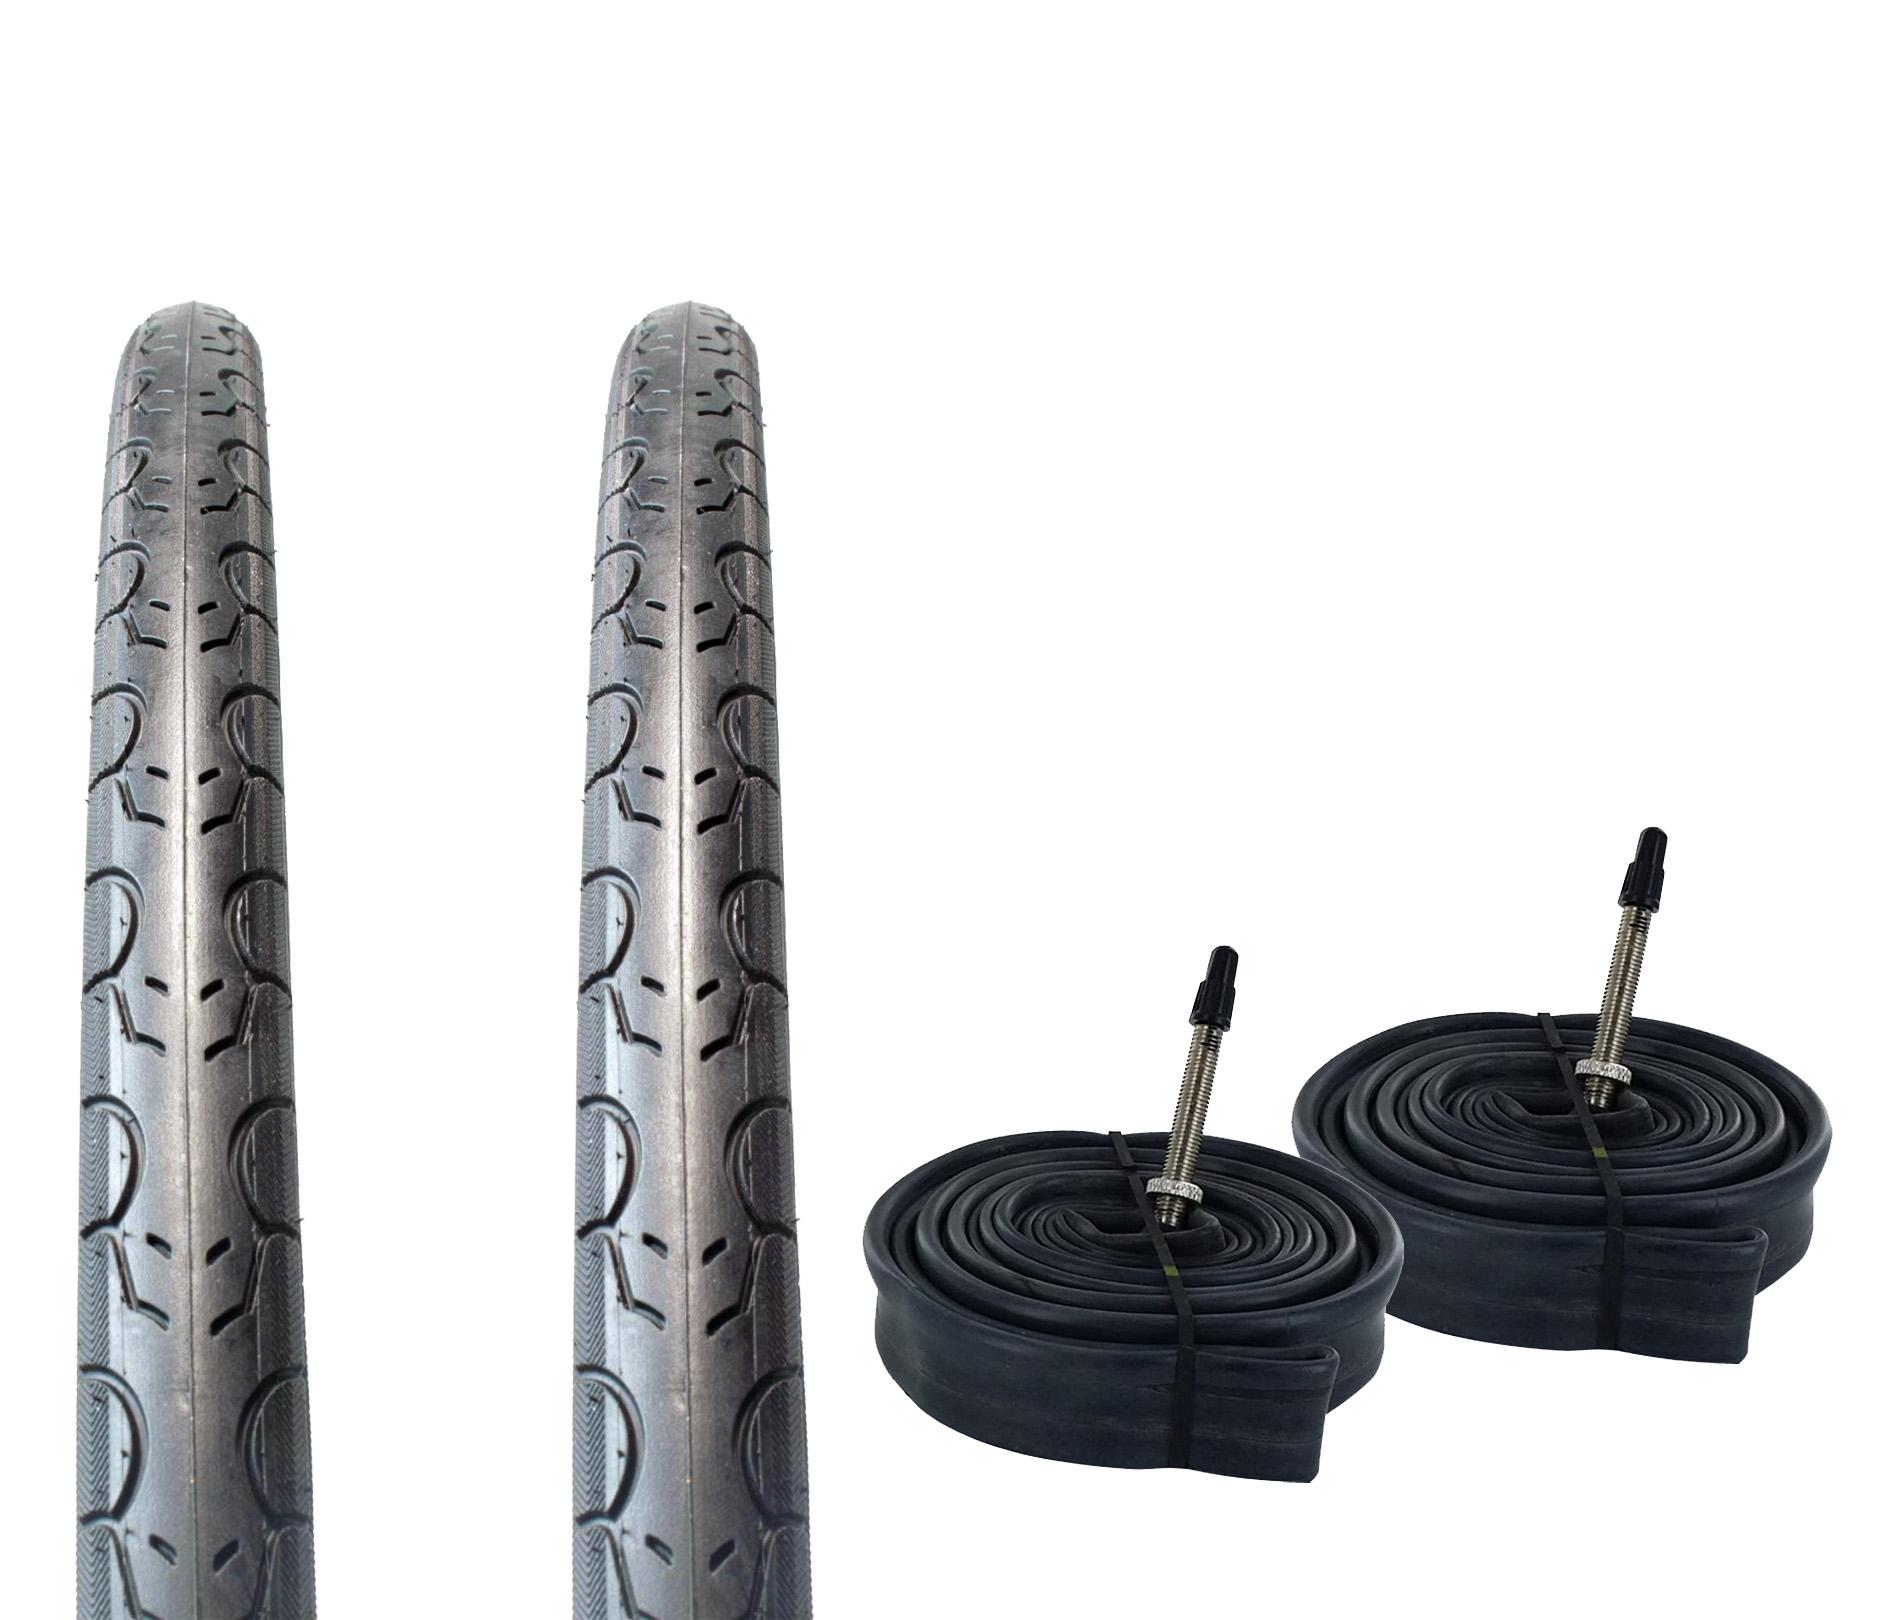 Presta//French 80 MM Valve Zol Bundle 2 Pack Z1076 Road Tires and Tube 700x25C